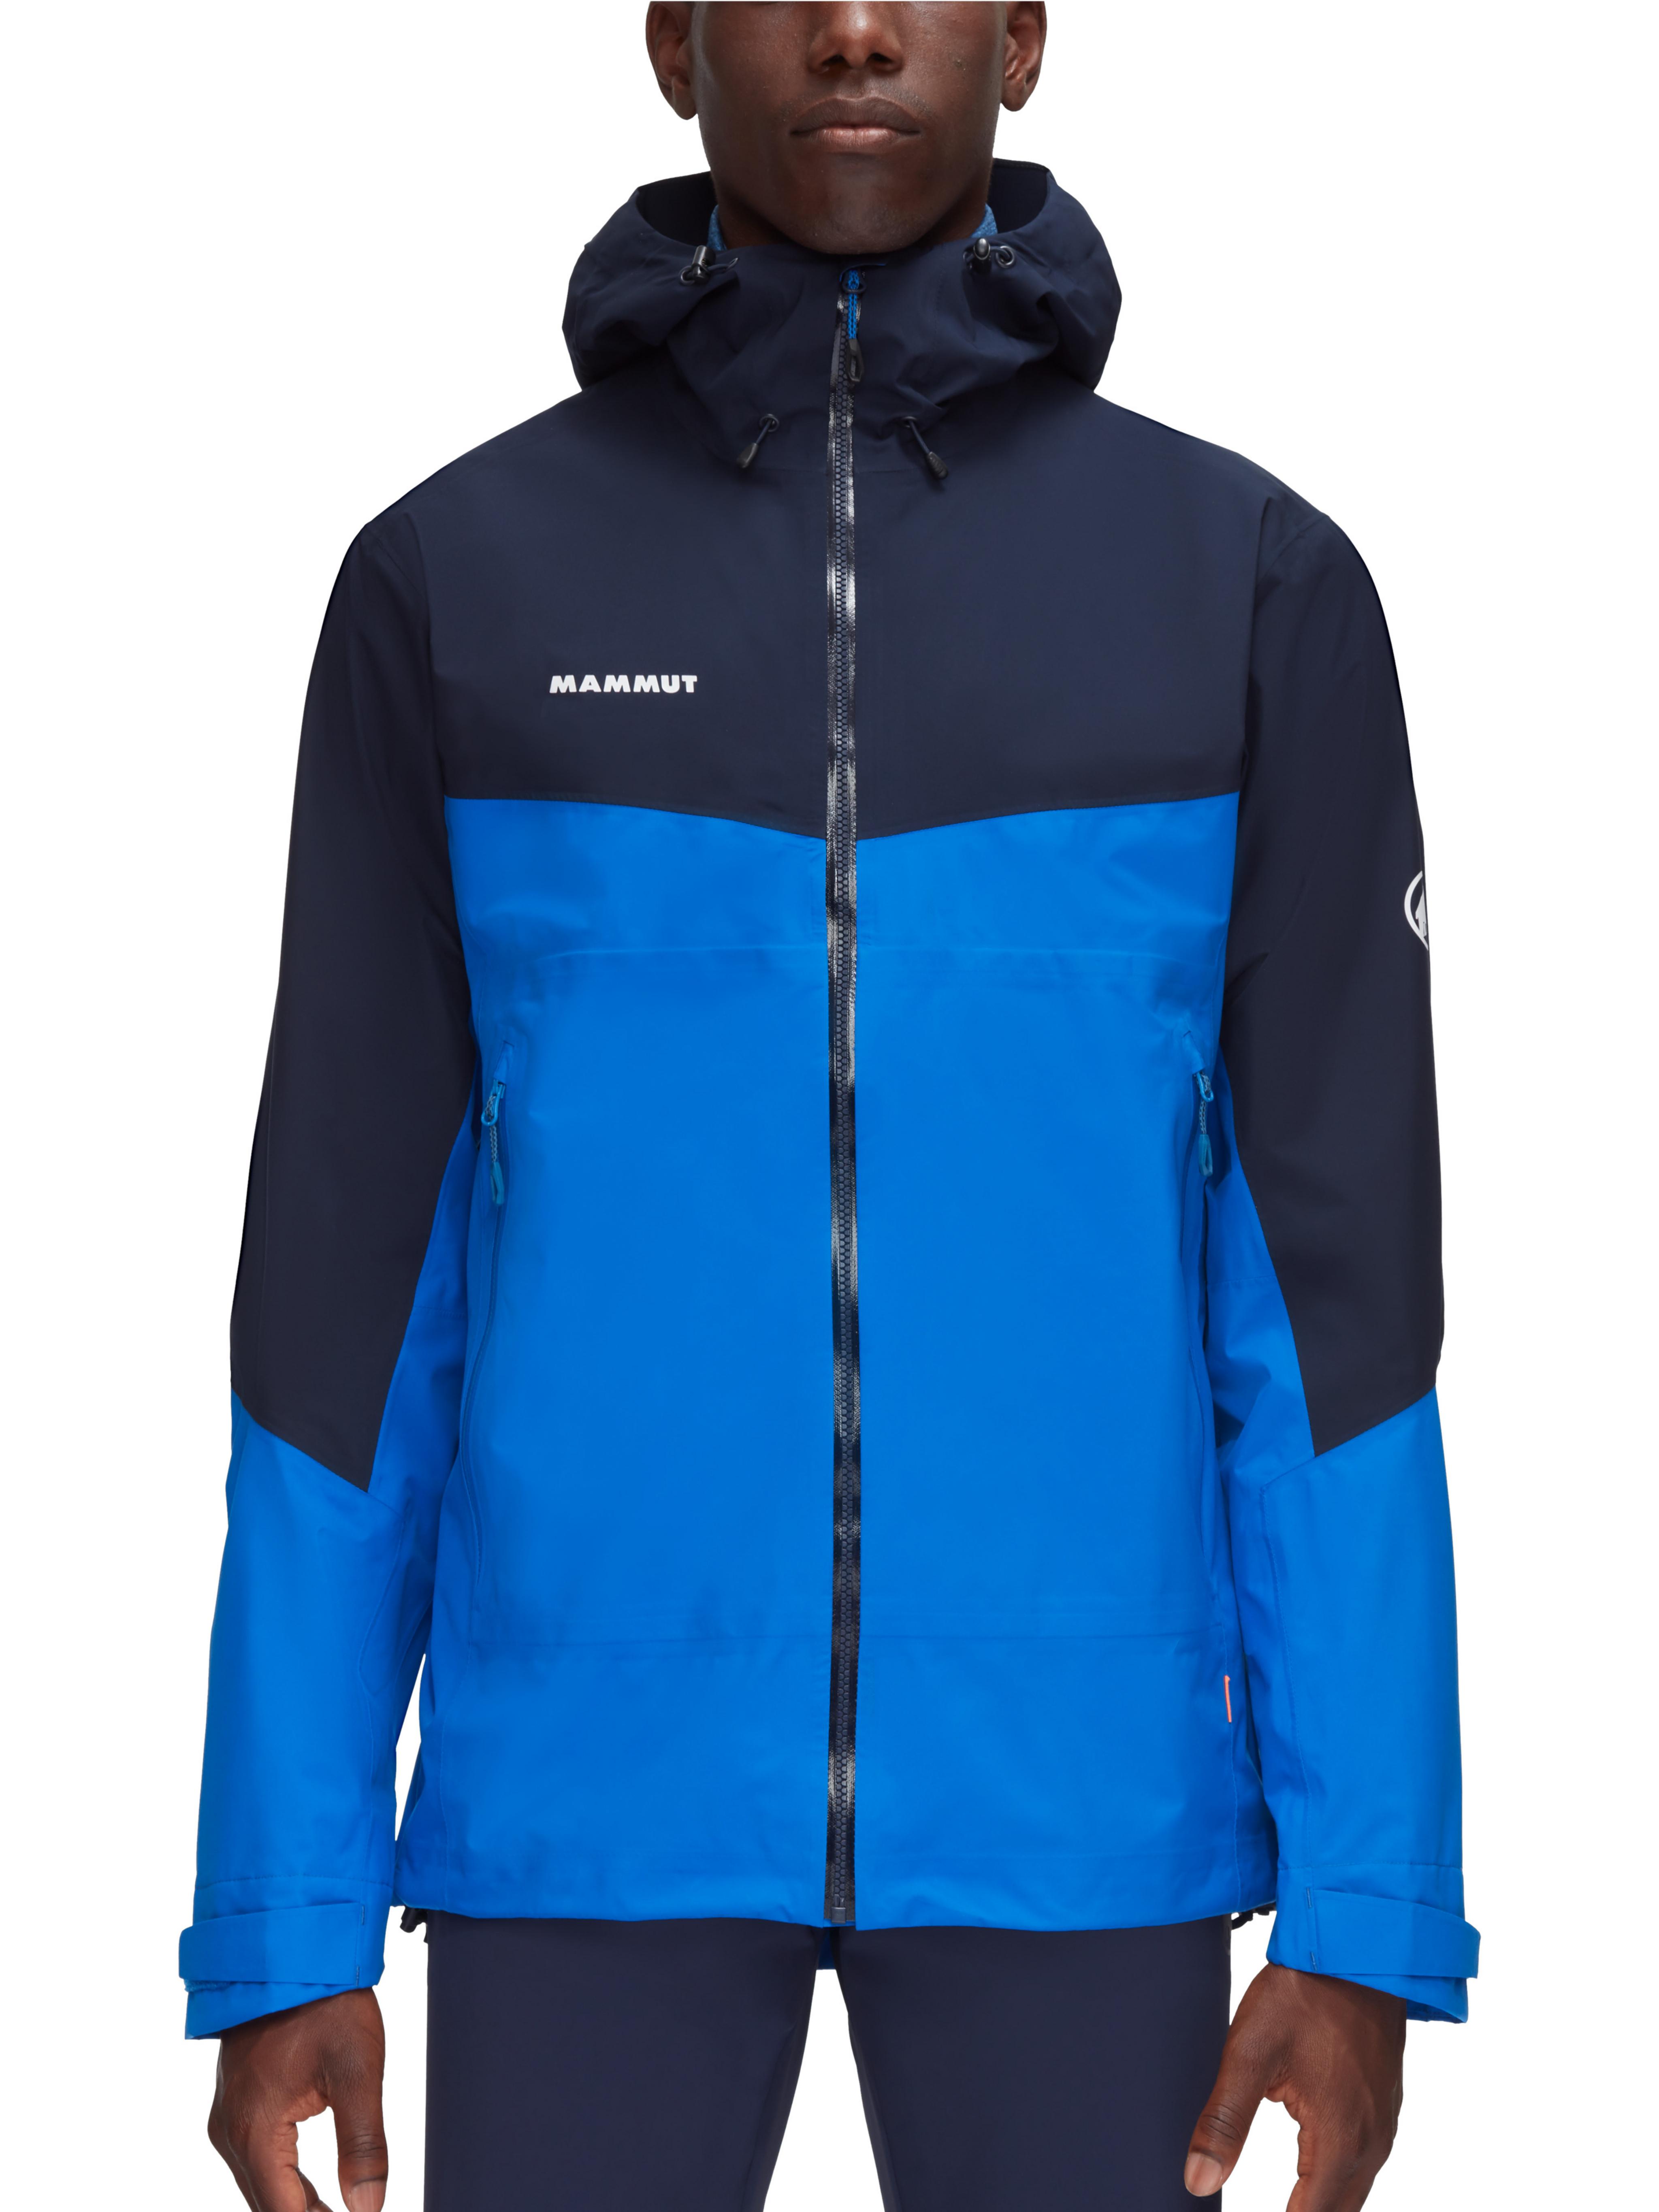 Convey Tour HS Hooded Jacket Men product image